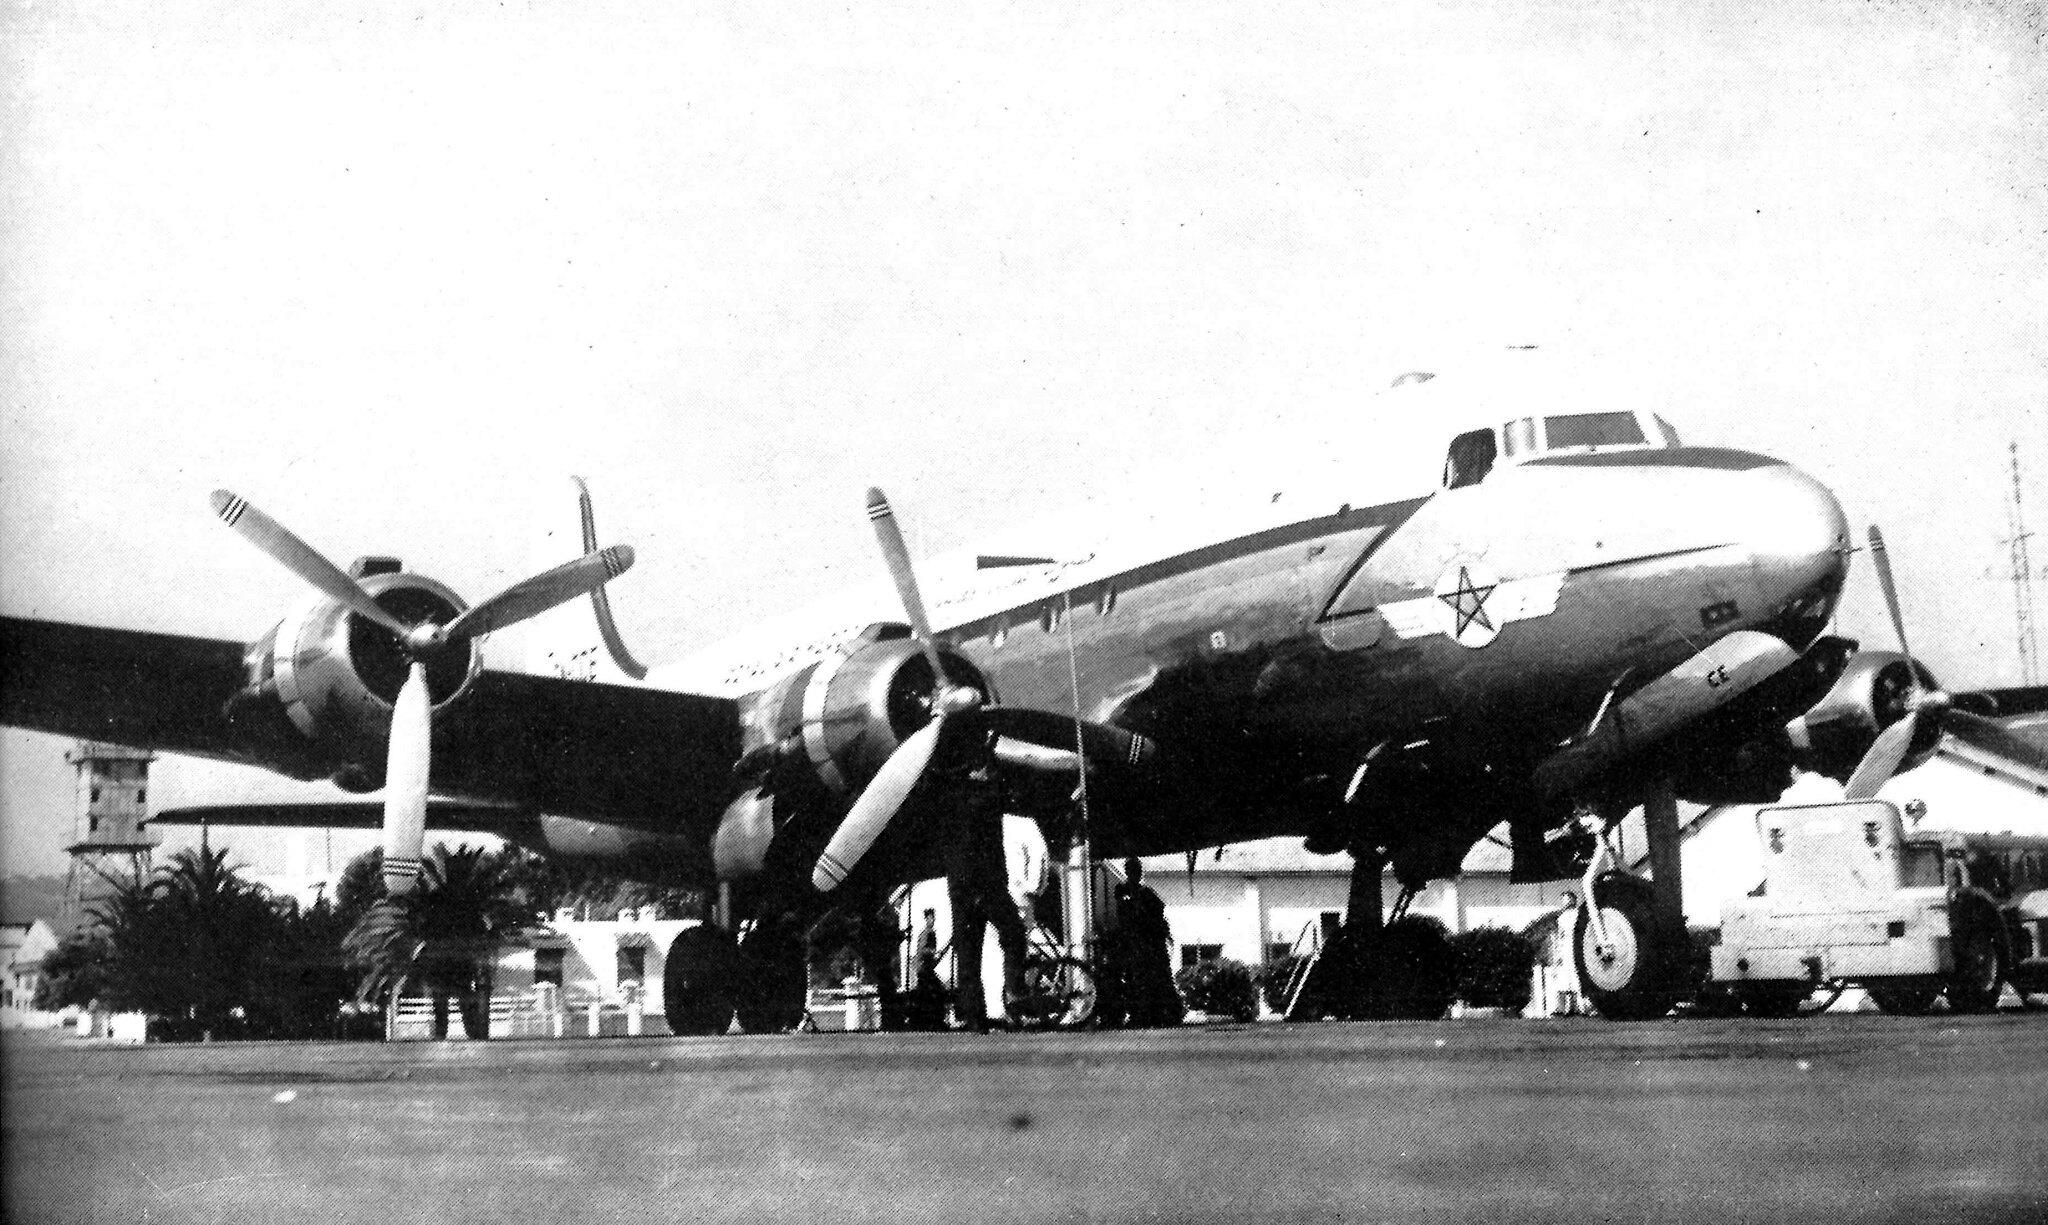 Anciens avions de la RAM - Page 4 48998780288_9575fbb8b5_k